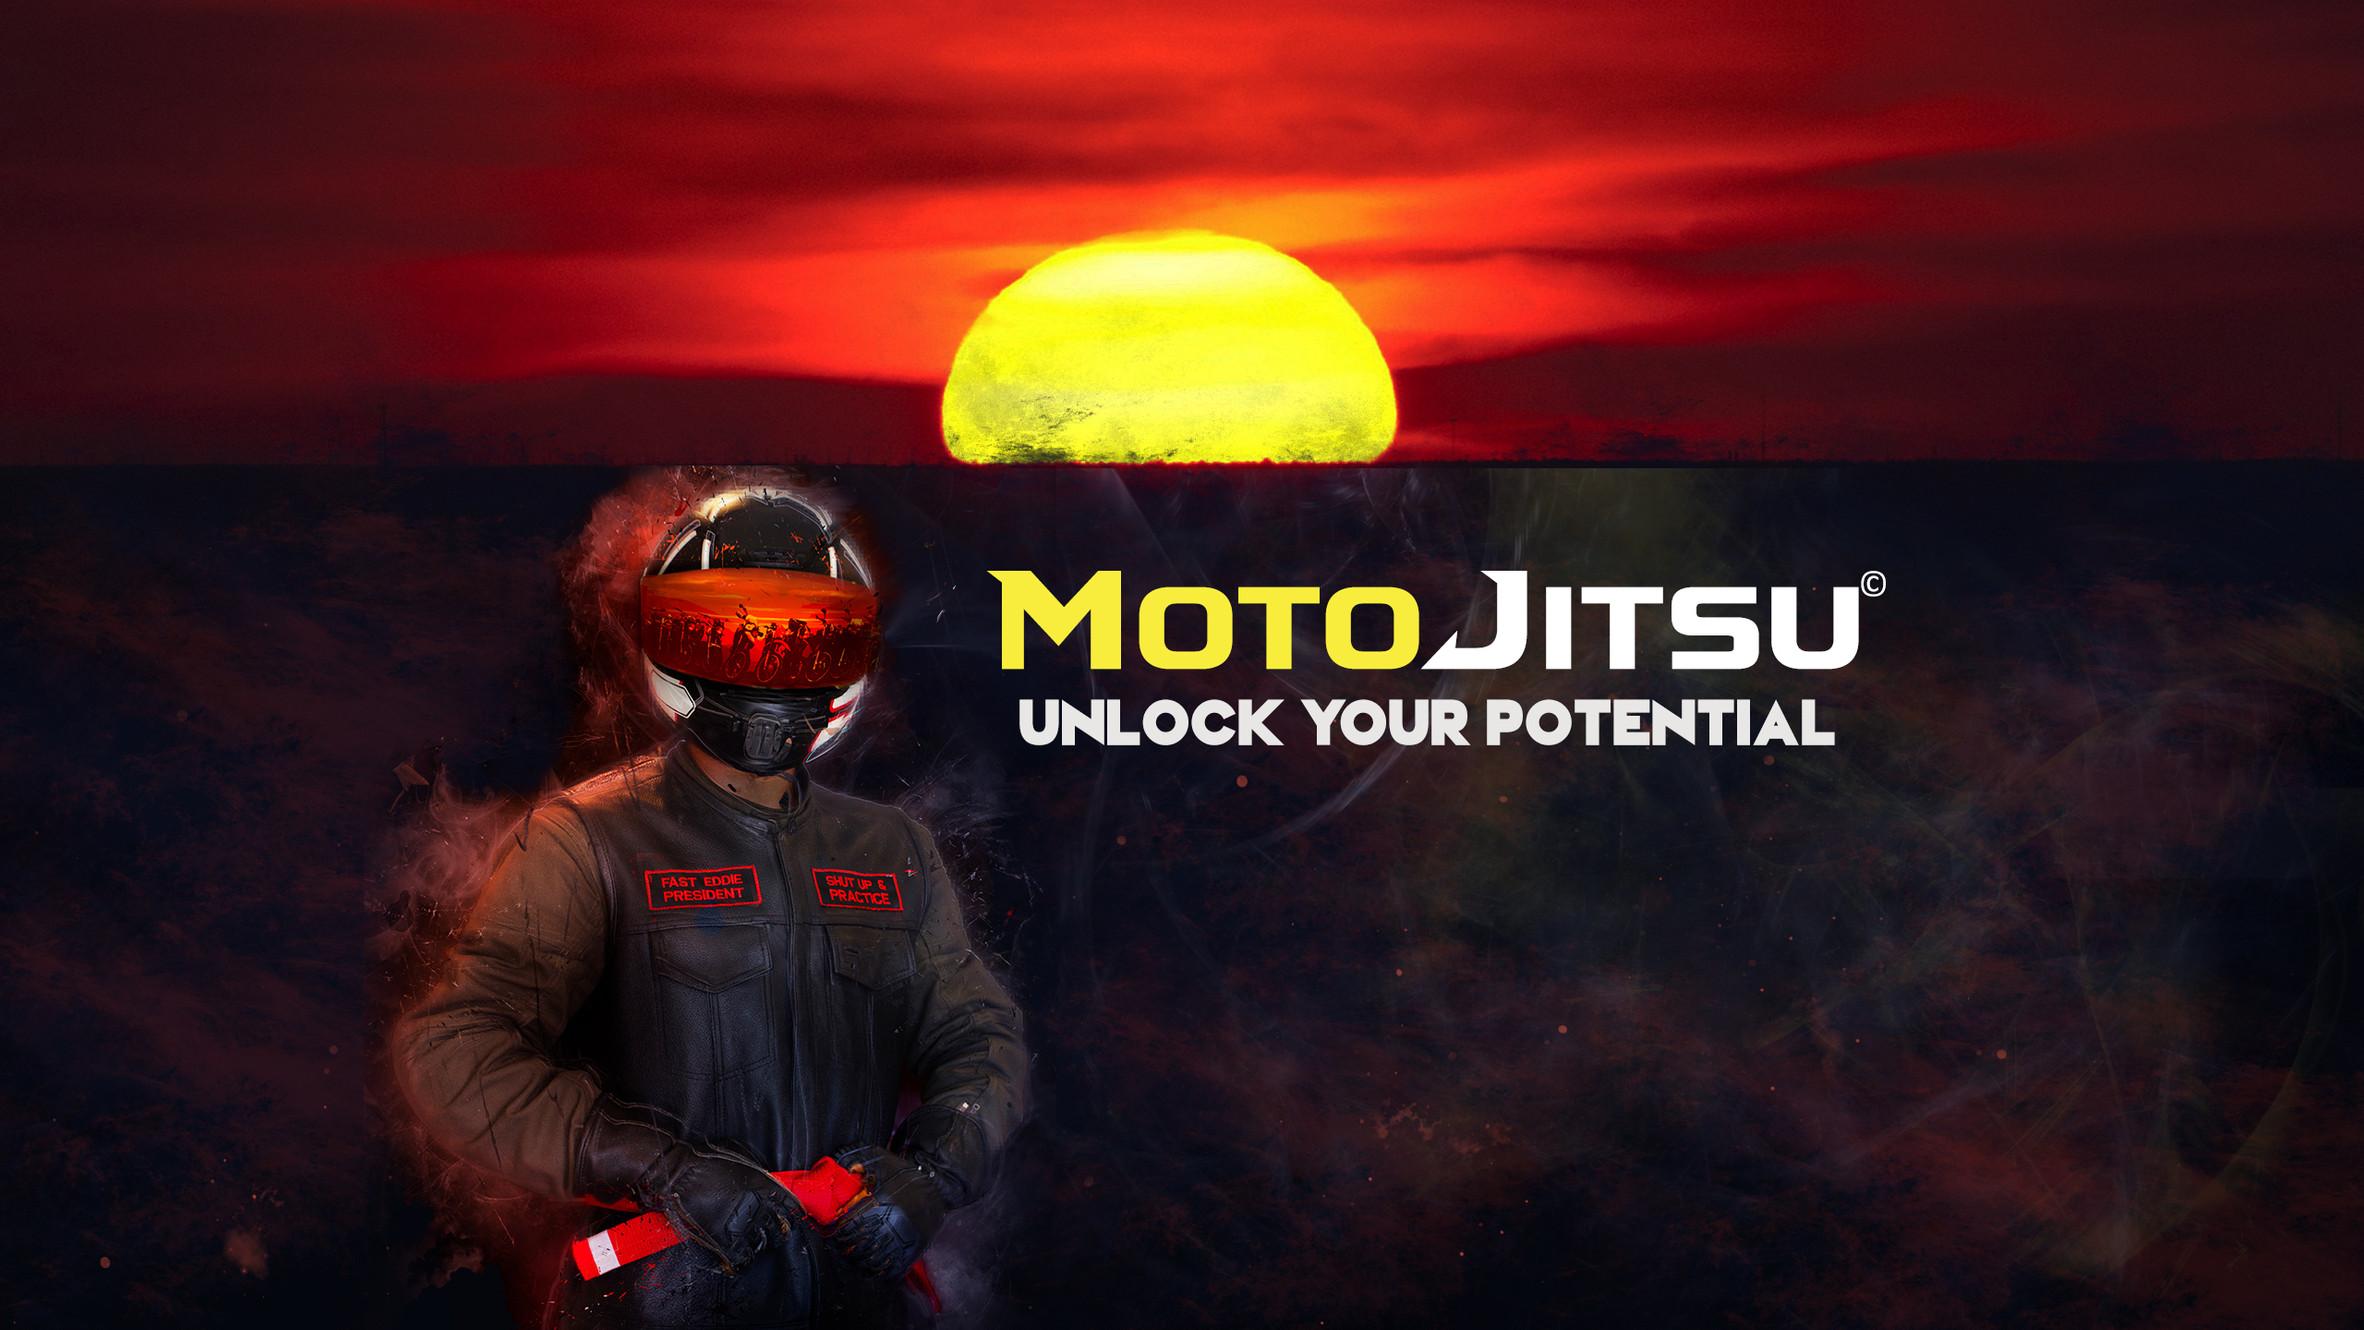 www.motojitsu.com